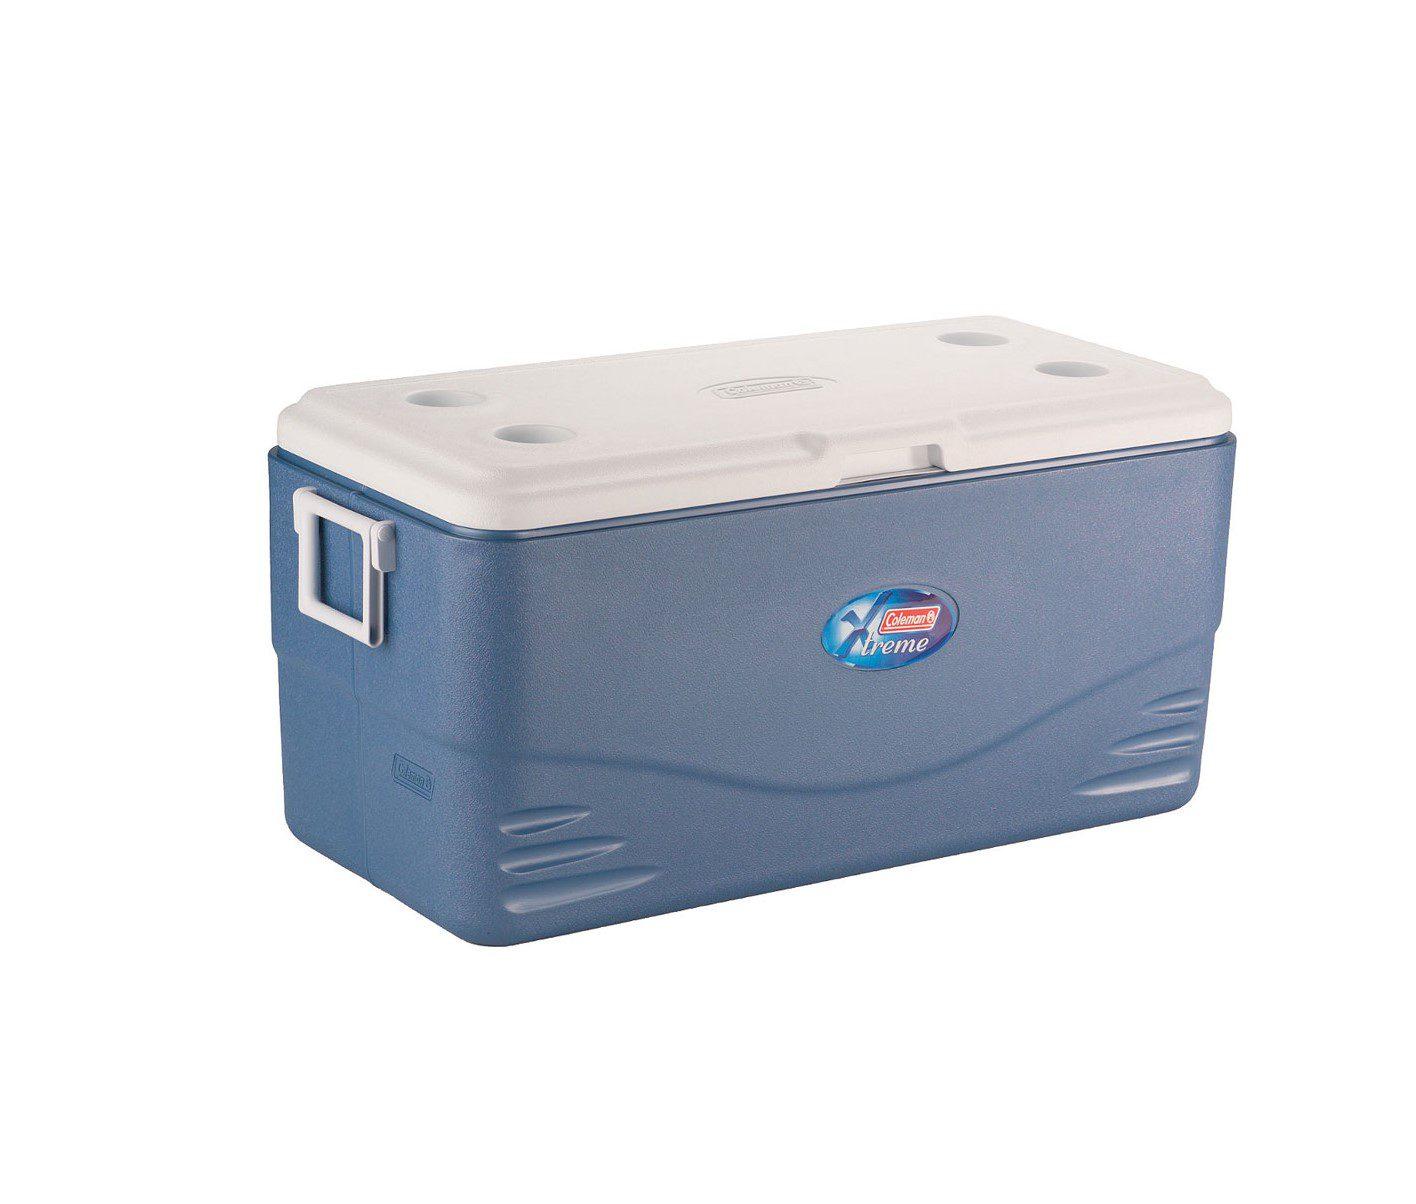 Coleman Xtreme 100qt Coolbox